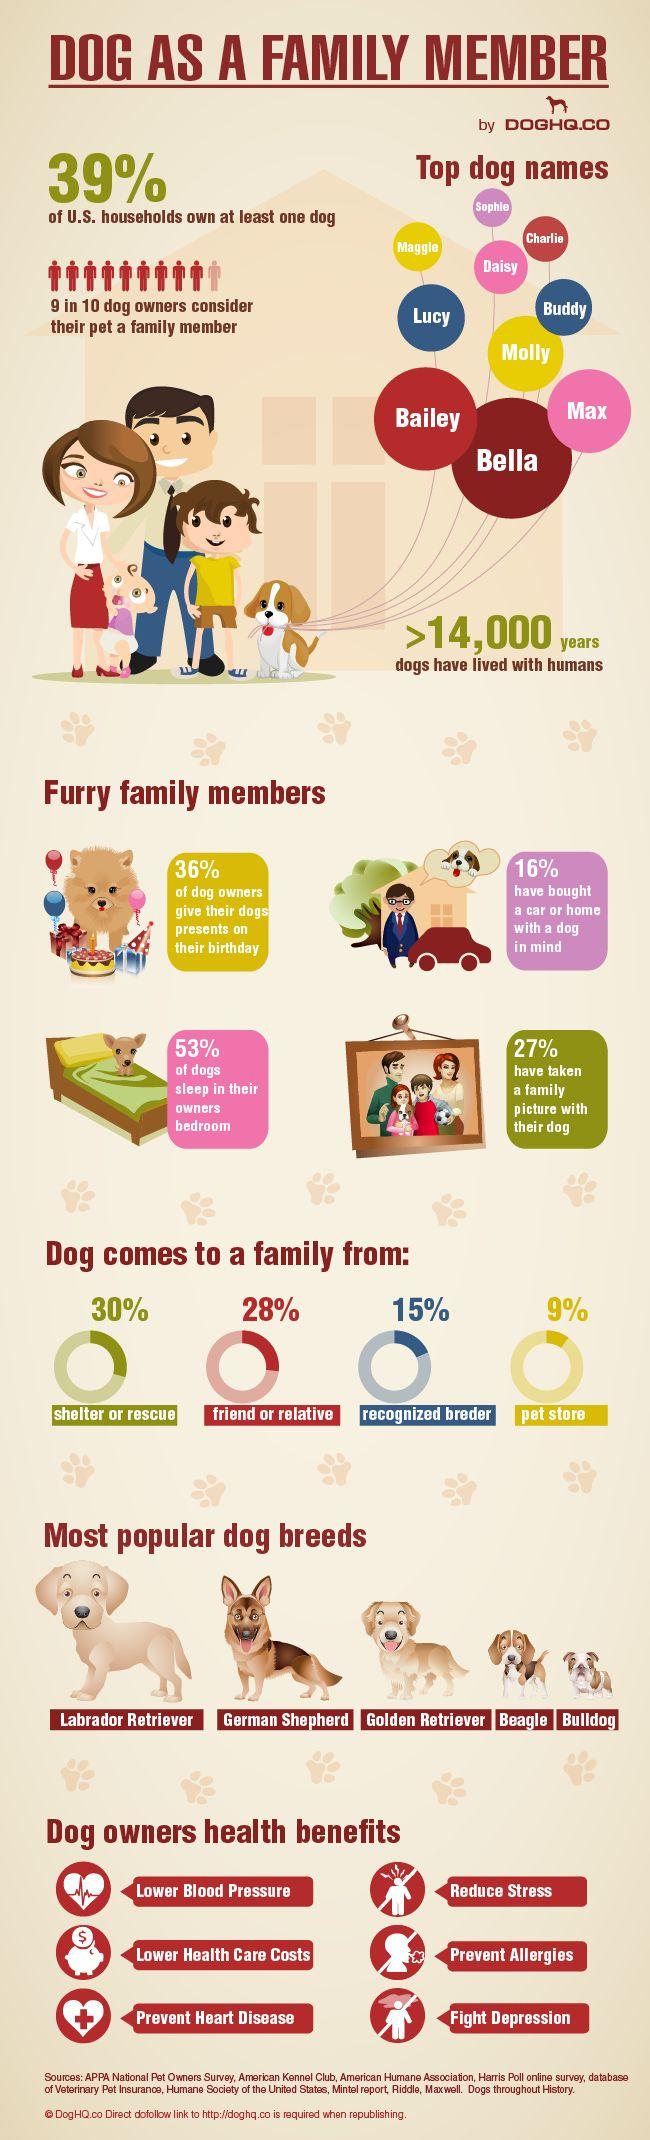 Dog As A Family Member